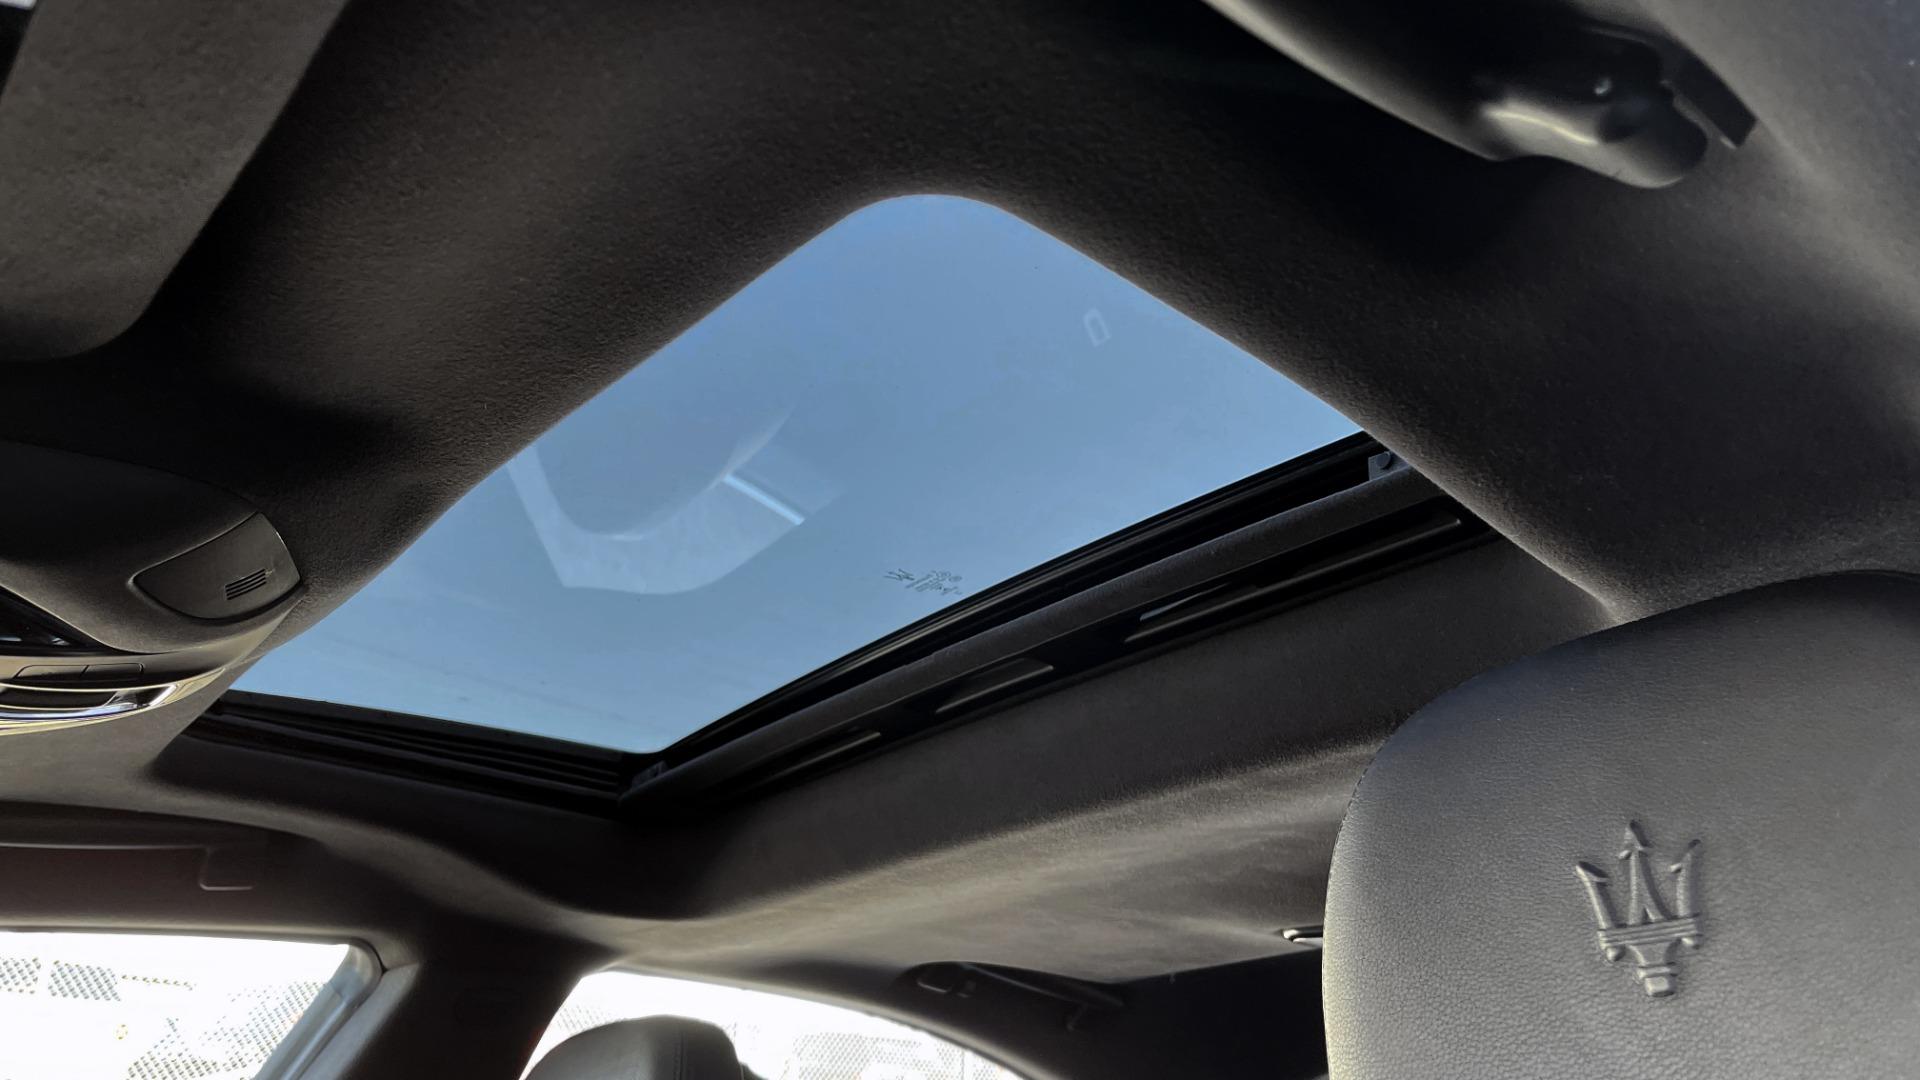 Used 2018 Maserati GHIBLI SEDAN / RWD / 3.0L V6 / SUNROOF / NAV / REARVIEW for sale $42,995 at Formula Imports in Charlotte NC 28227 49